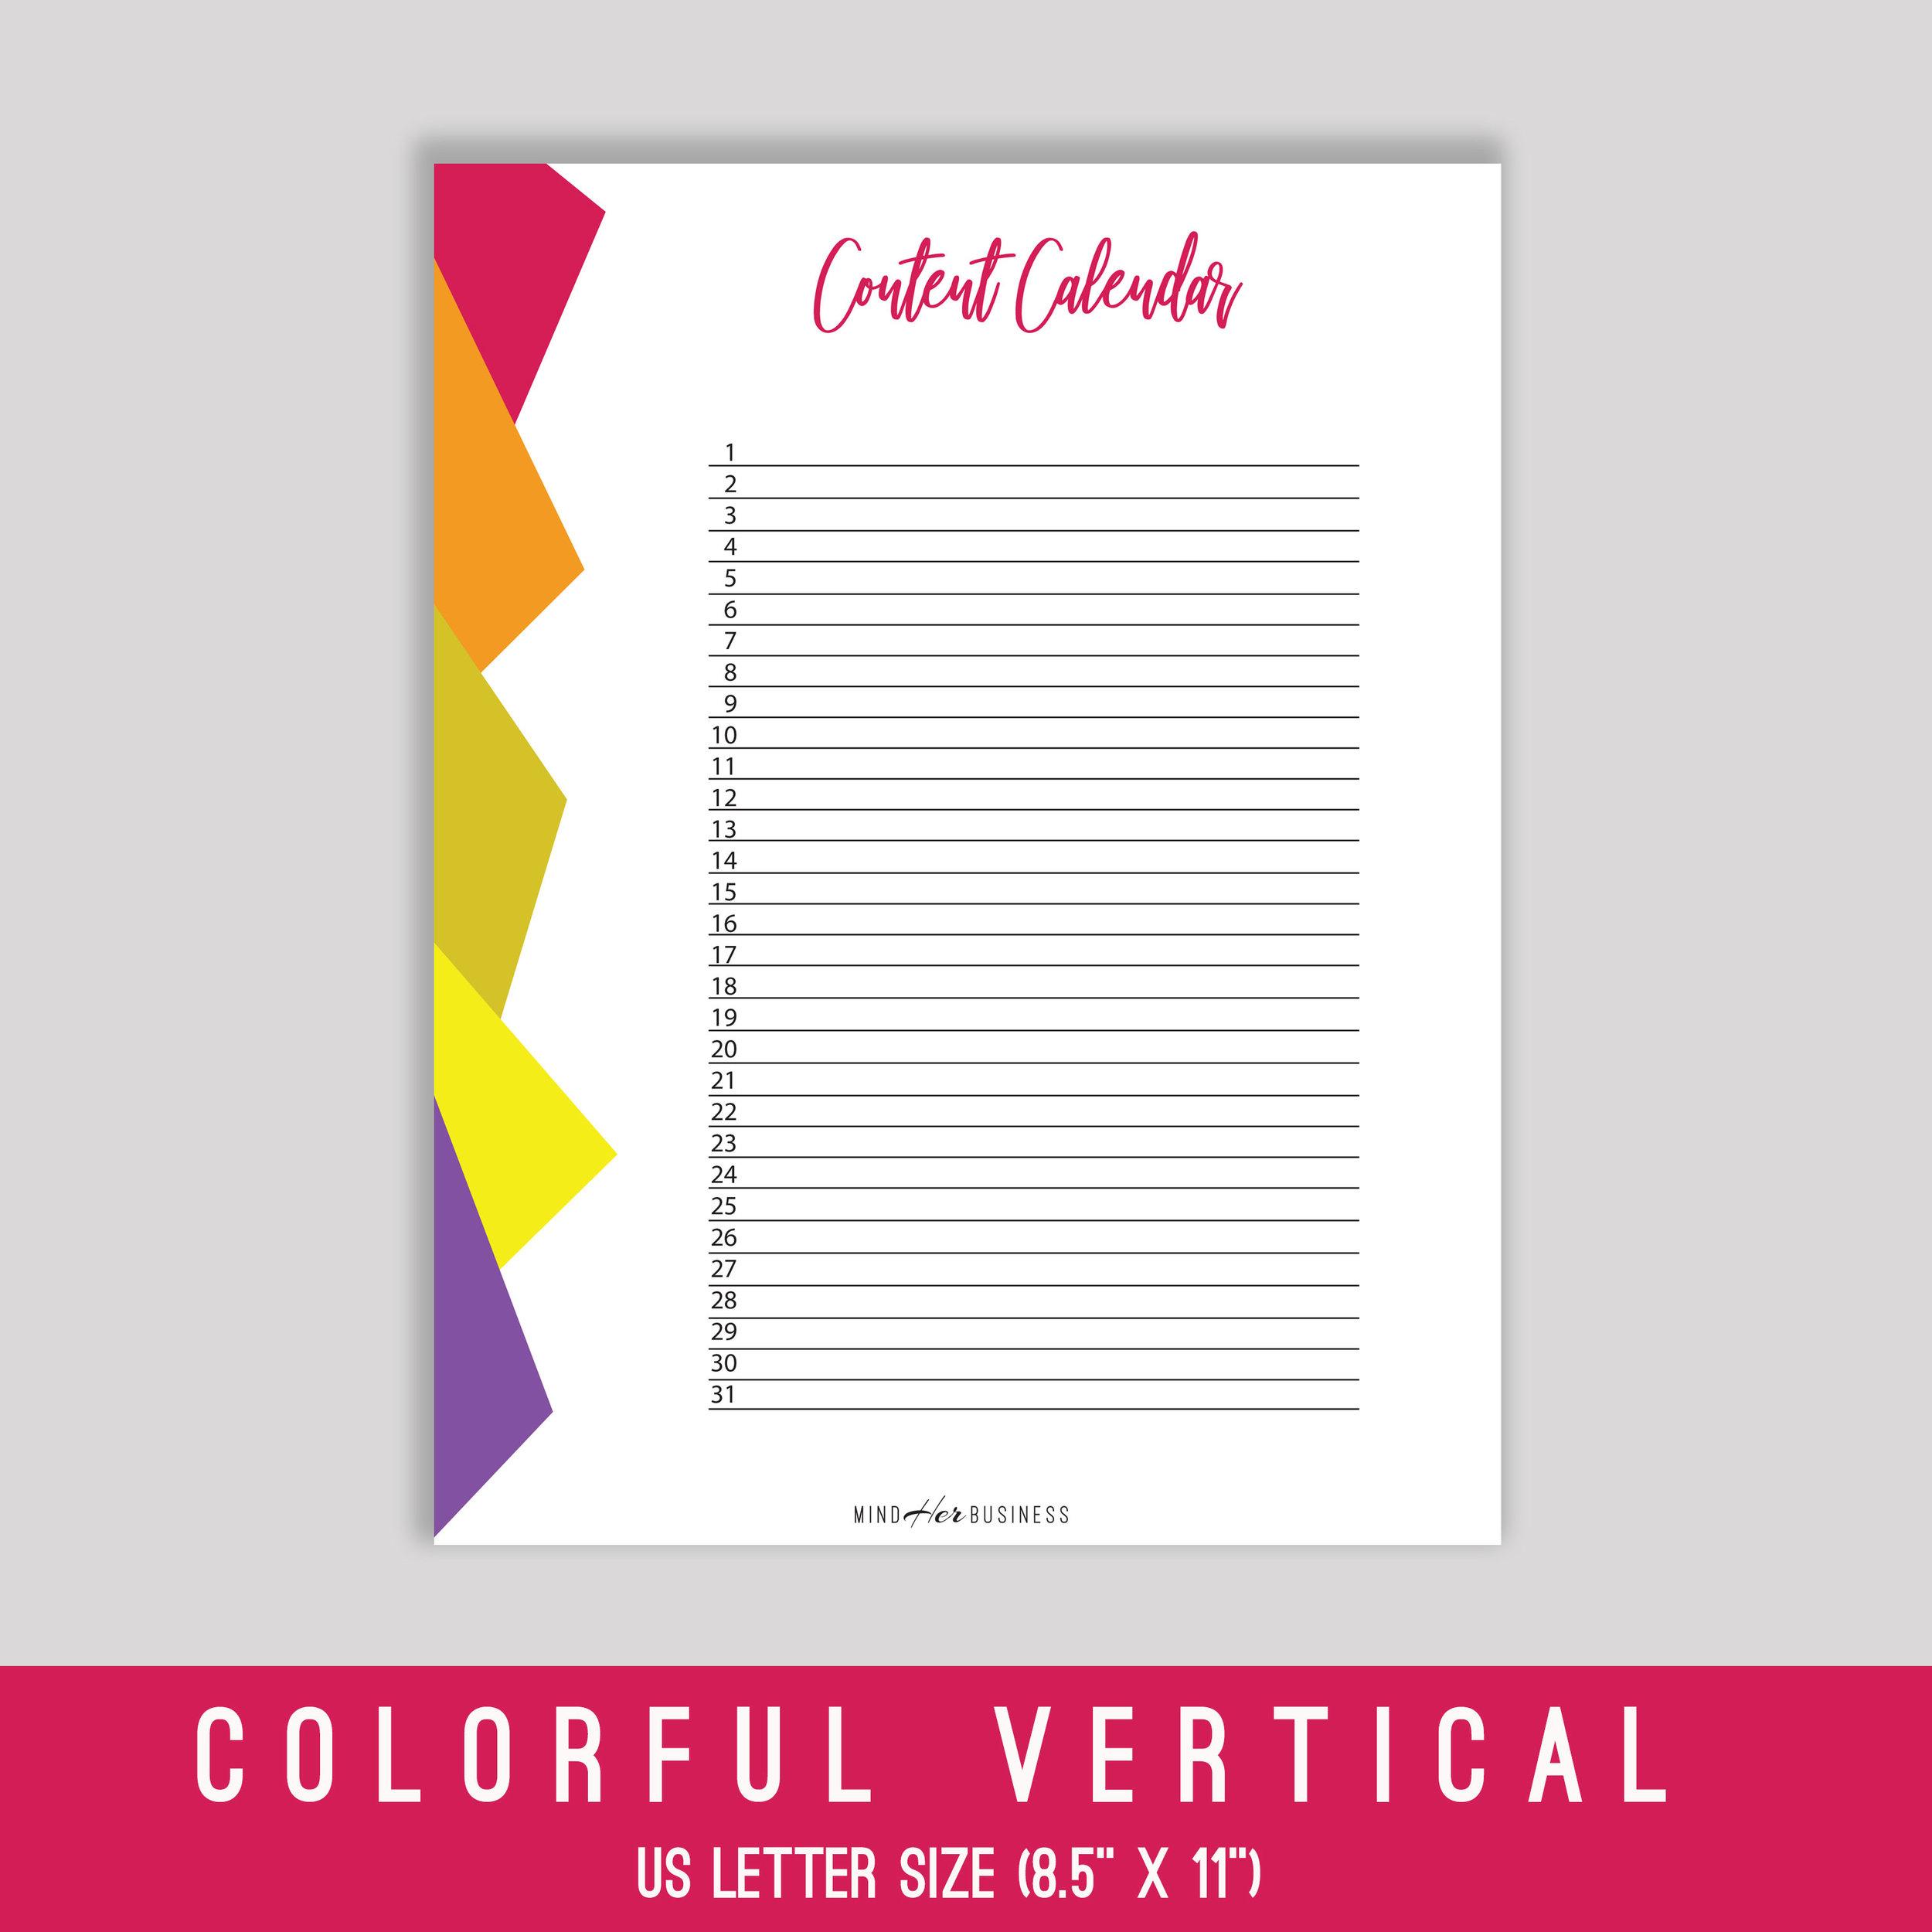 mhb-calendar-mockup-colorful-letter.jpg